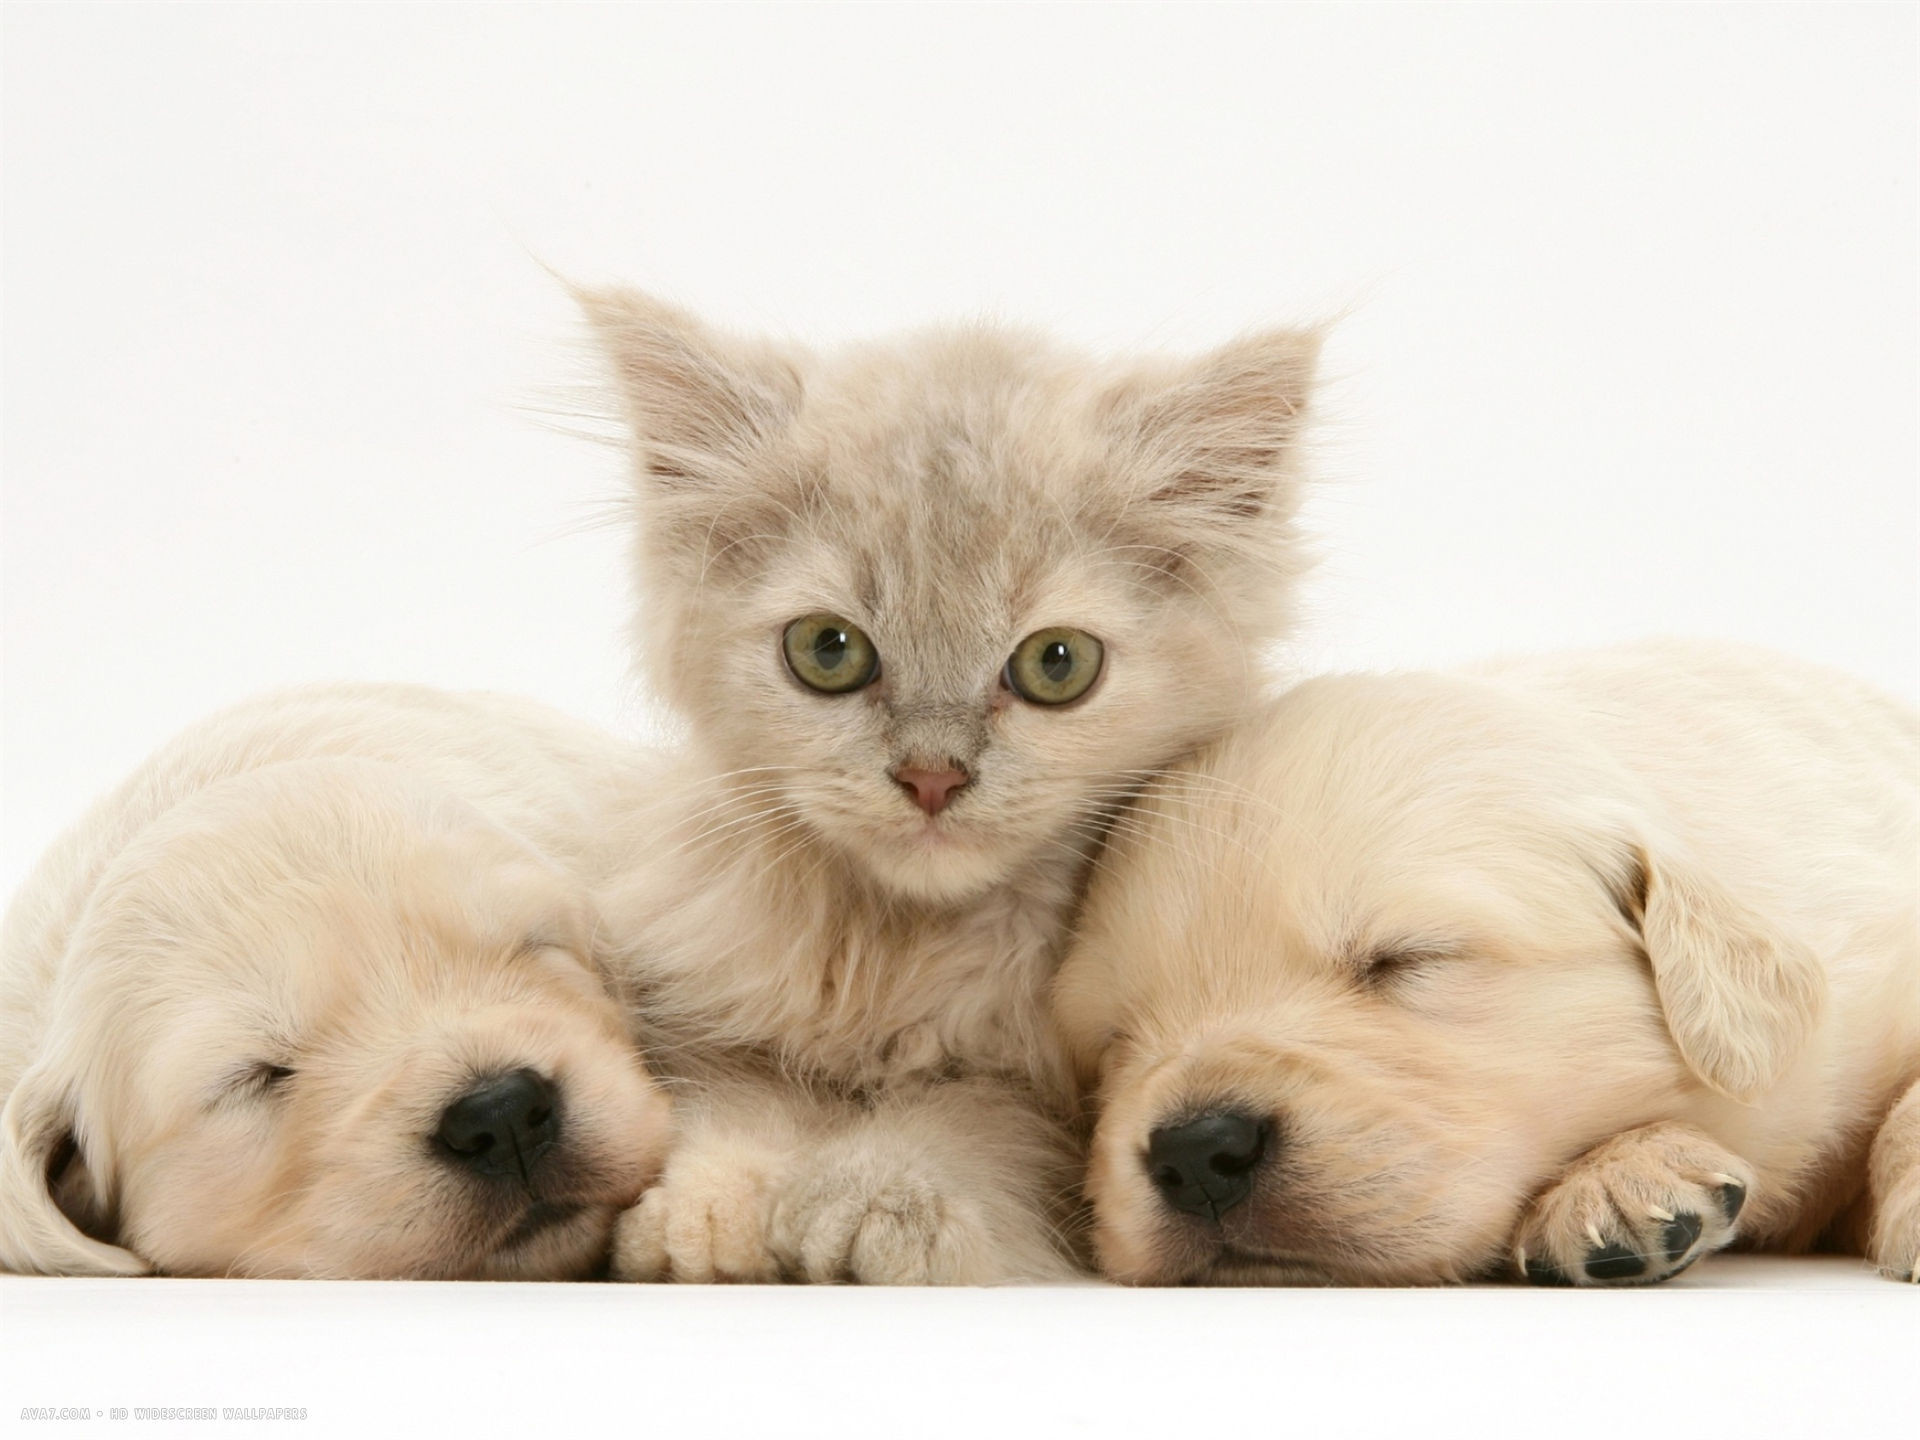 lilac tortoiseshell kitten between two sleeping golden retriever puppies  desktop wallpaper